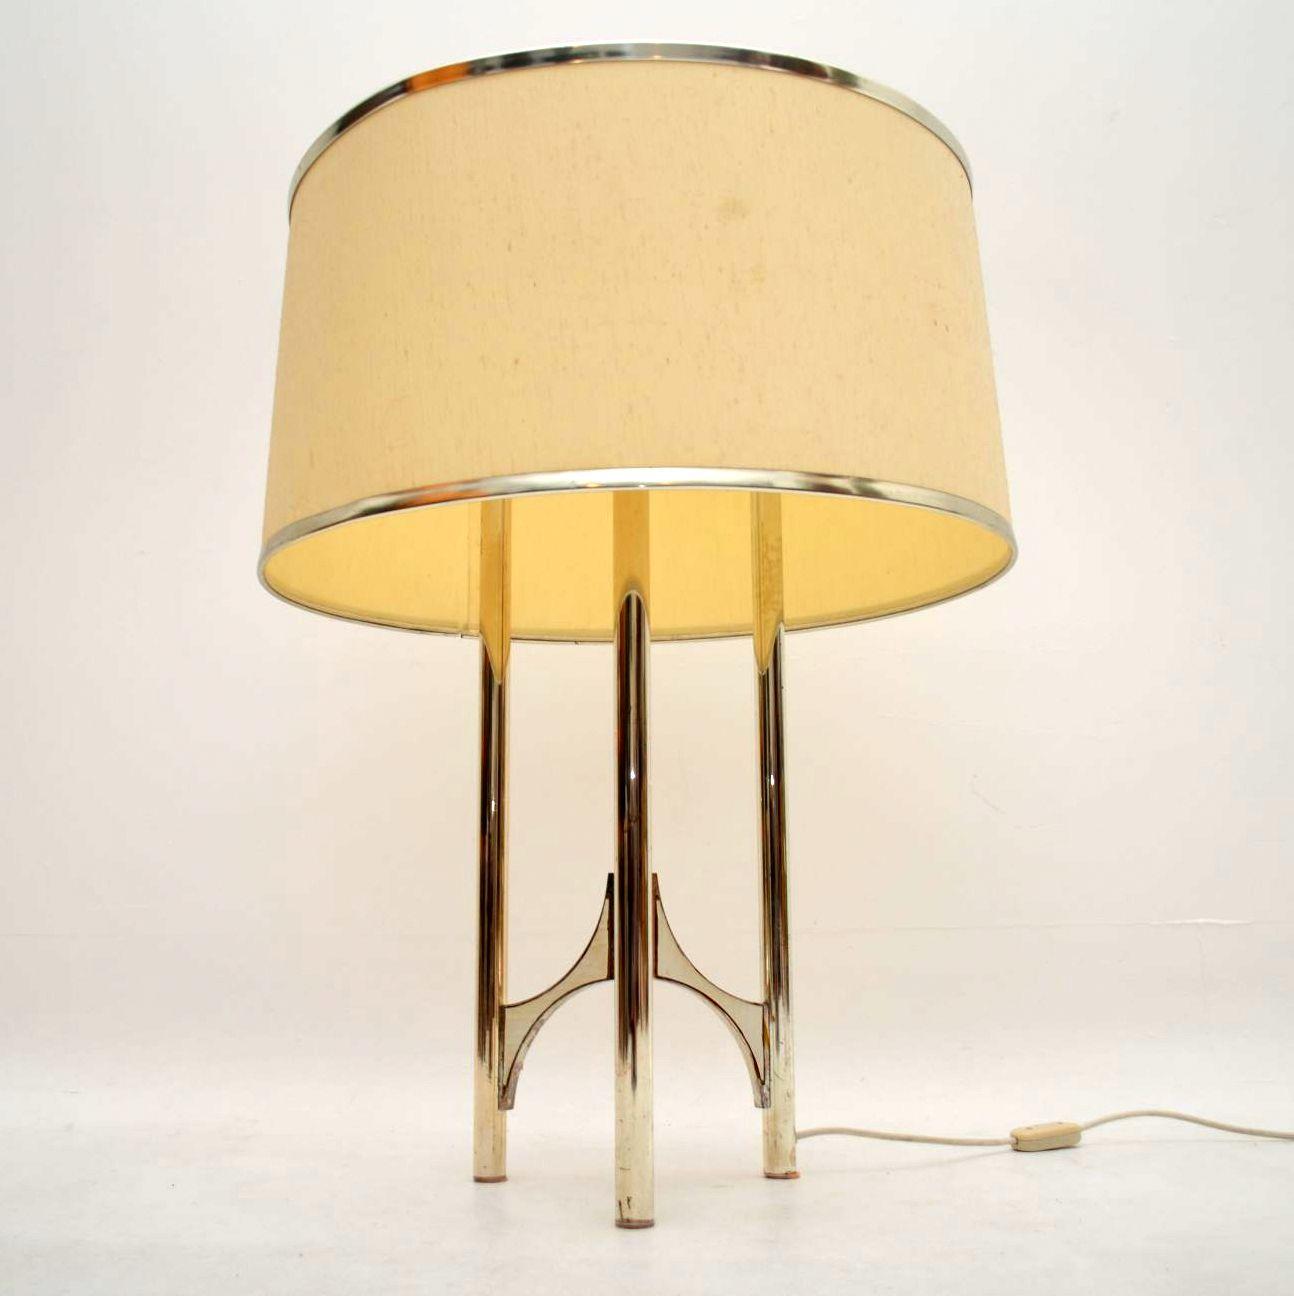 Retro italian floor lamp by gaetano sciolari vintage 1960s retro italian floor lamp by gaetano sciolari vintage 1960s aloadofball Gallery